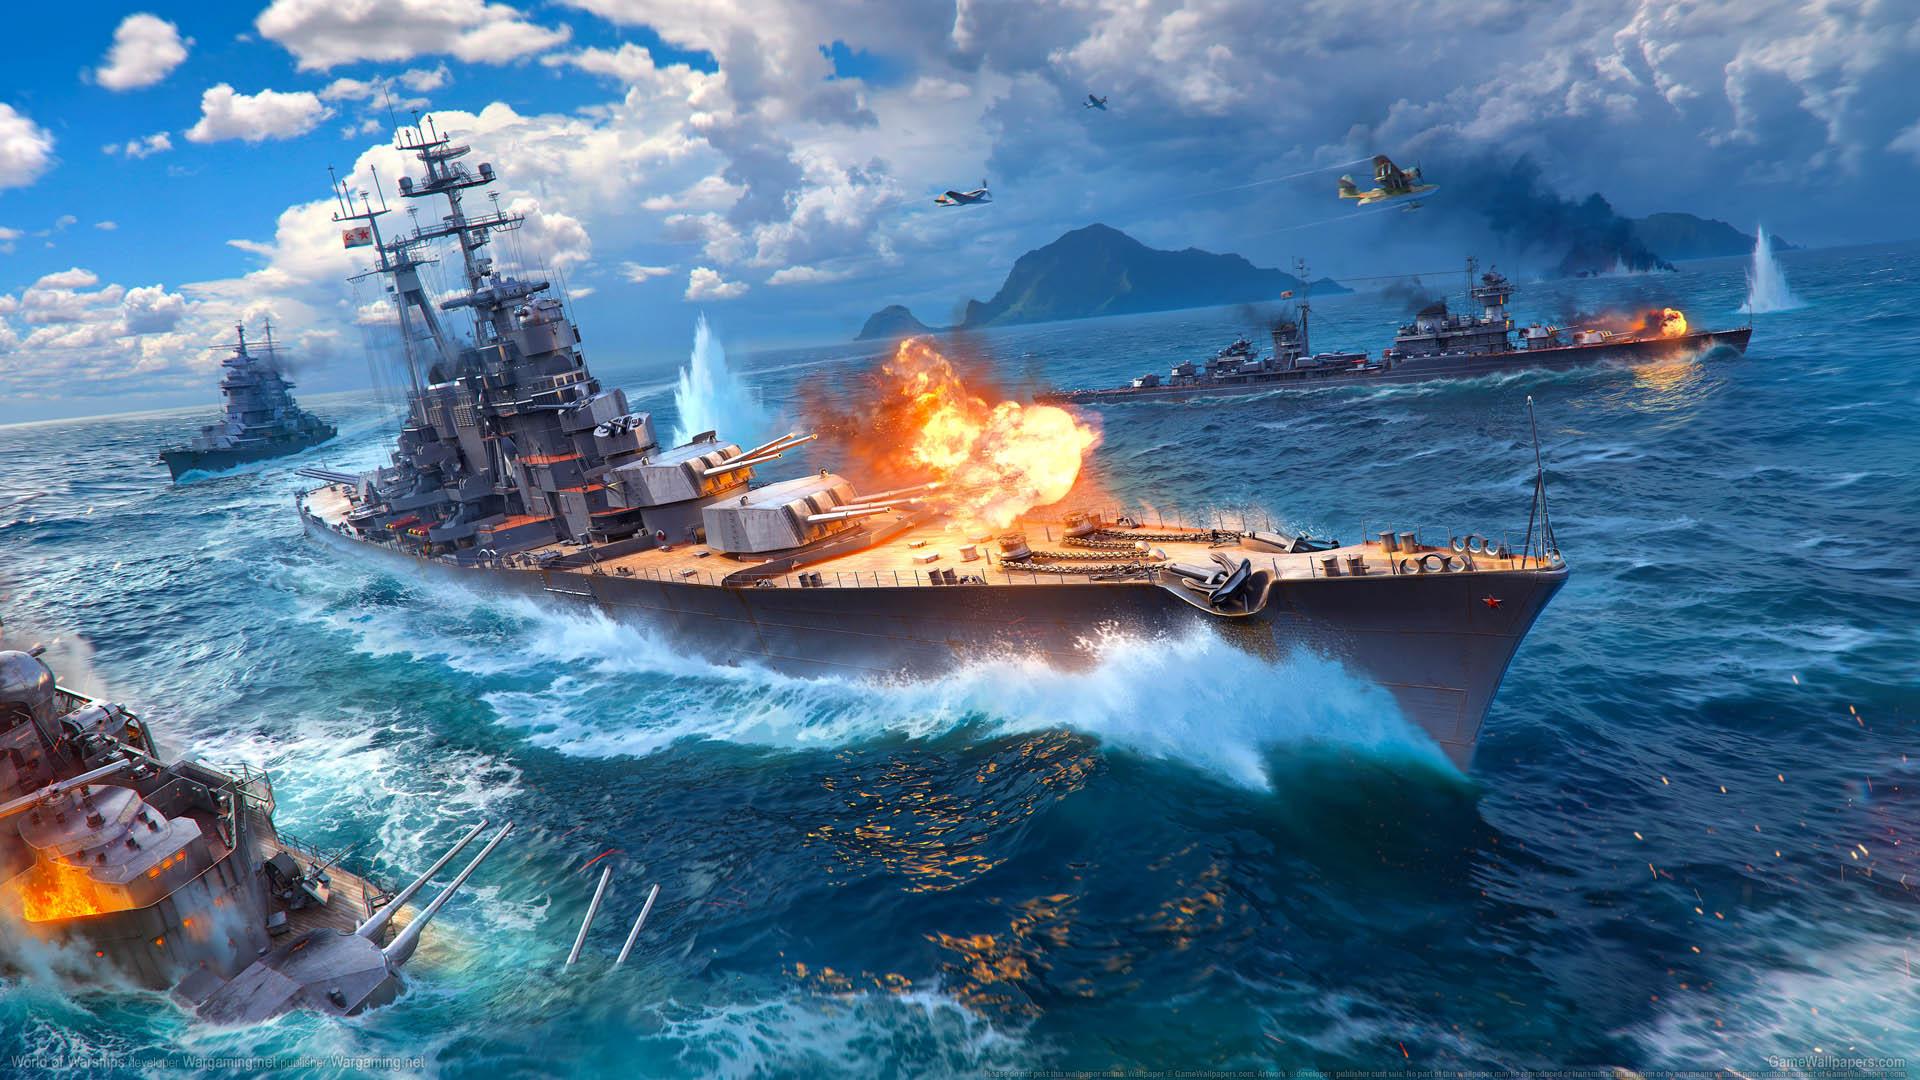 World of Warships wallpaper 10 1920x1080